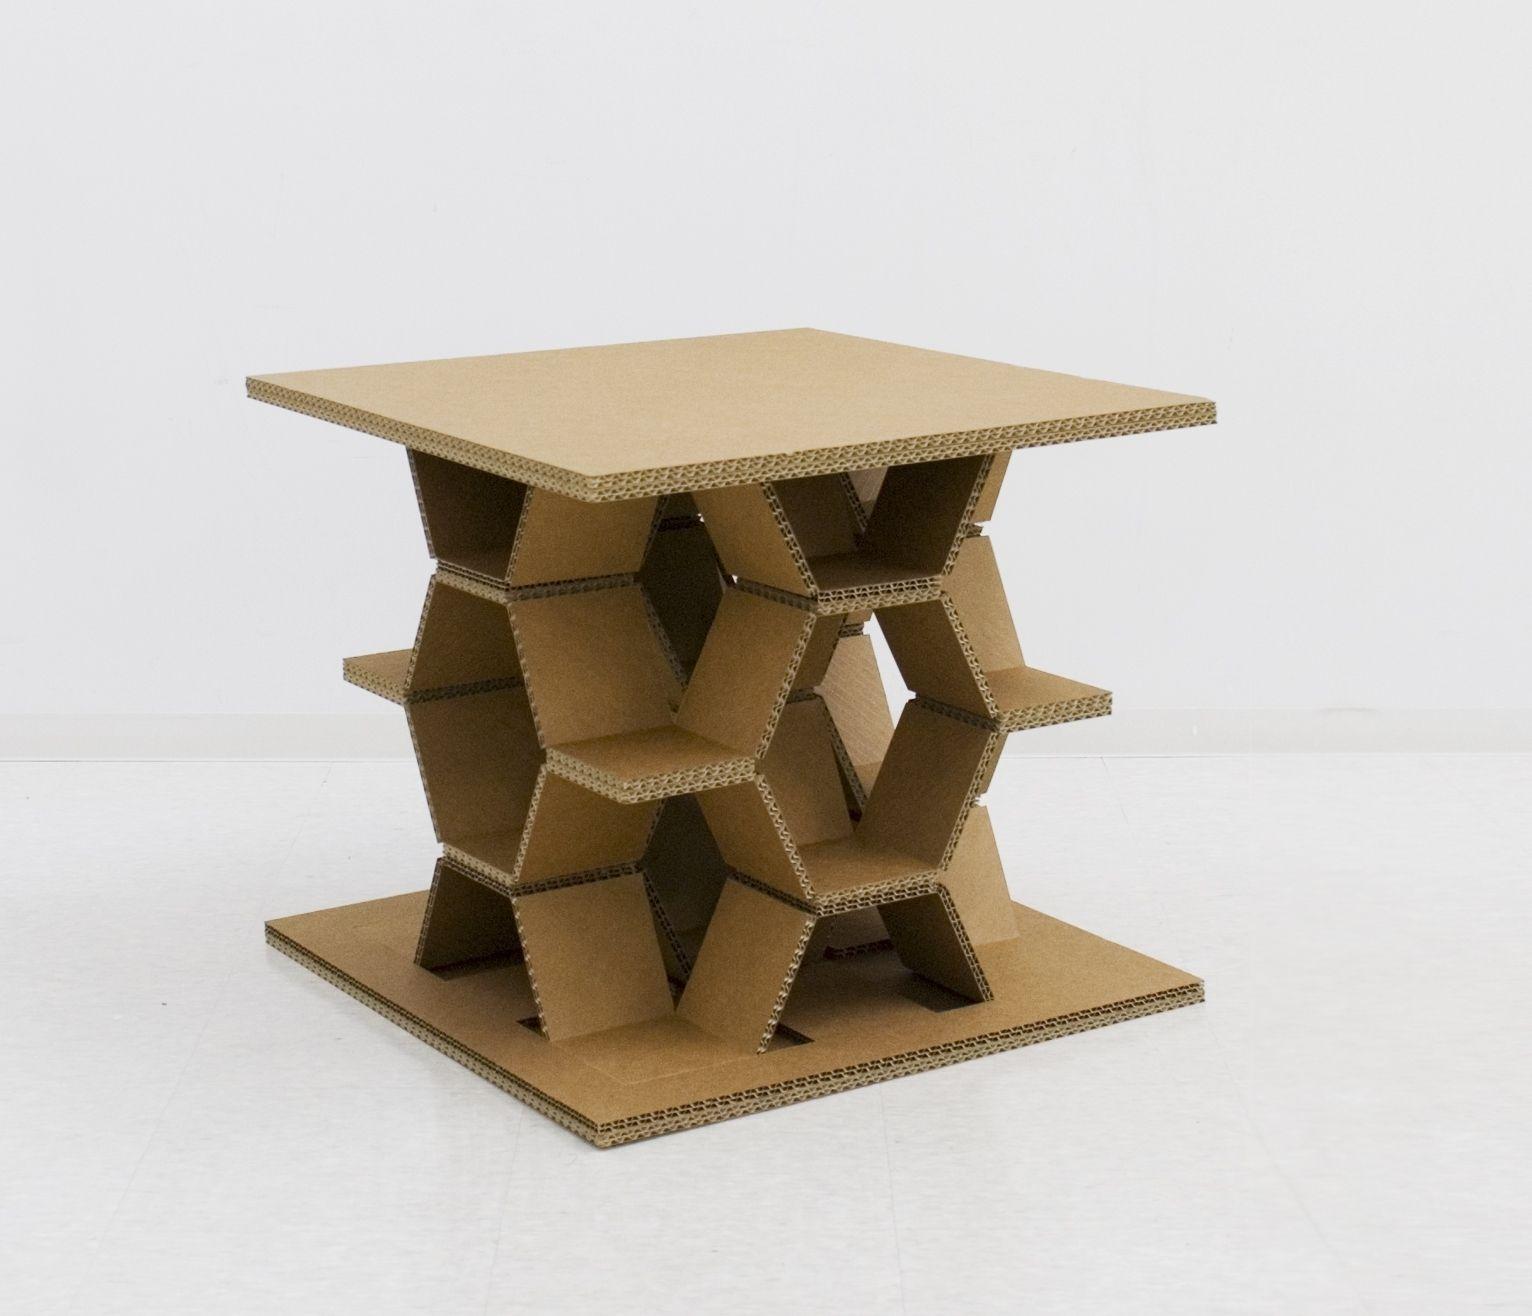 Pin By Paulfixie On Cardboard Design Cardboard Furniture Cardboard Design Cardboard Crafts